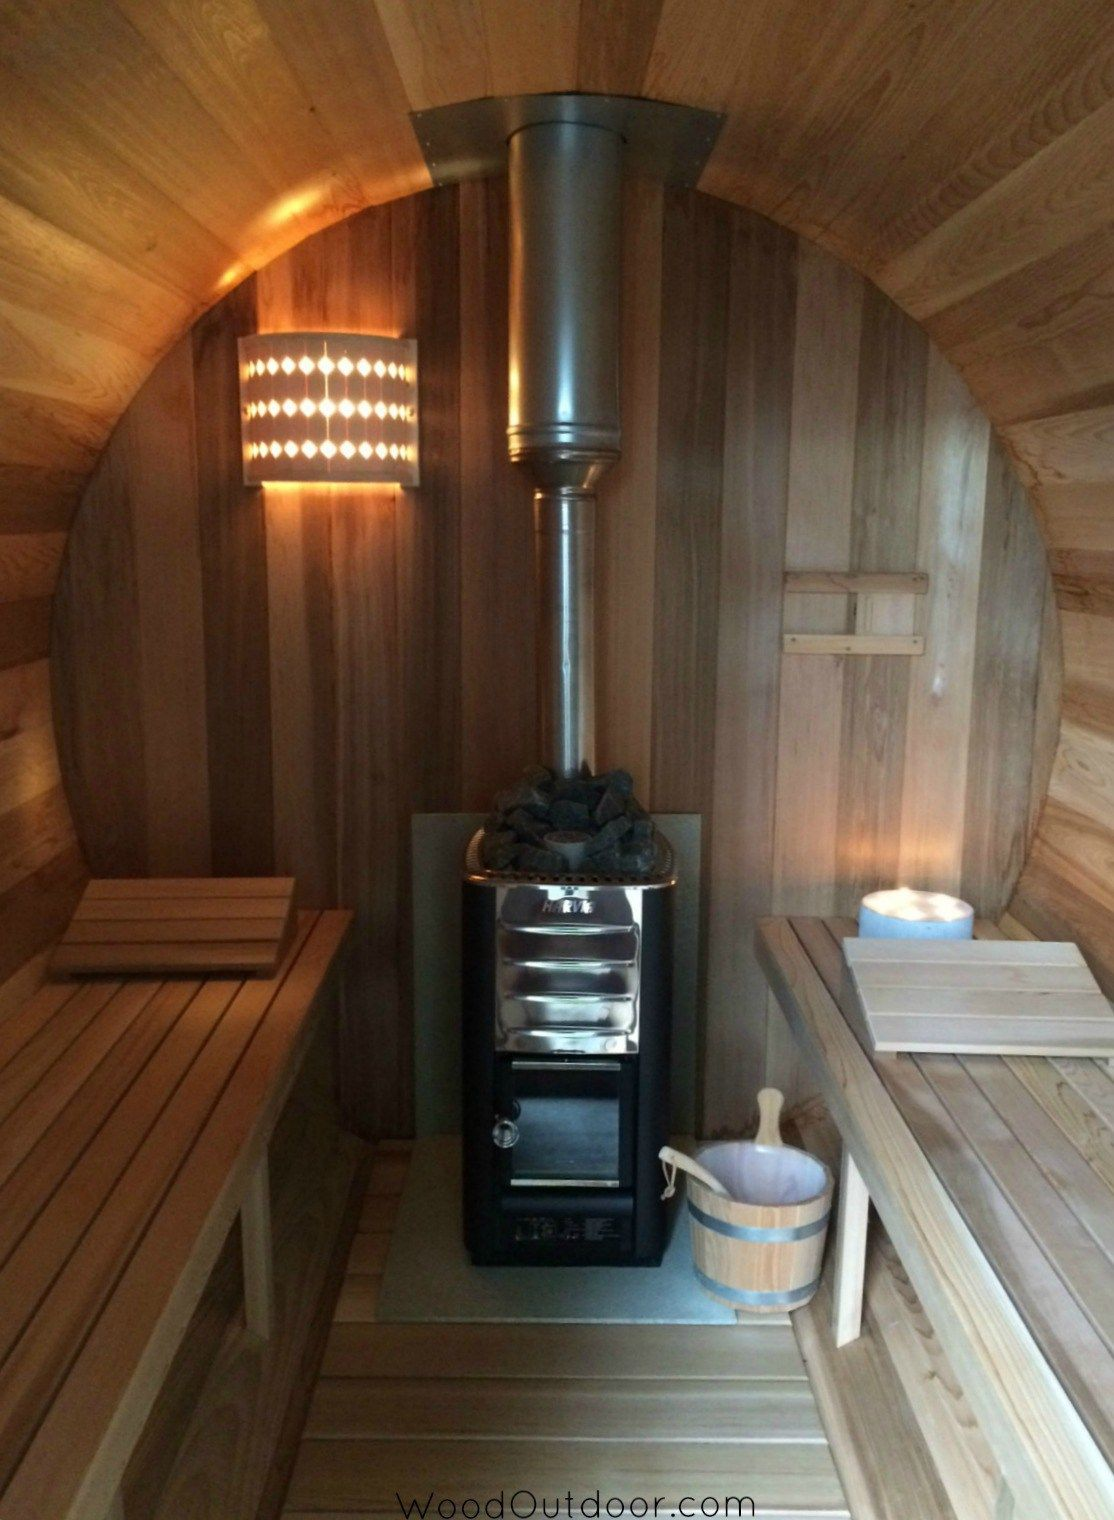 Sauna Saunaville Www Saunaville Com: Barrel Sauna Harvia Houtkachel